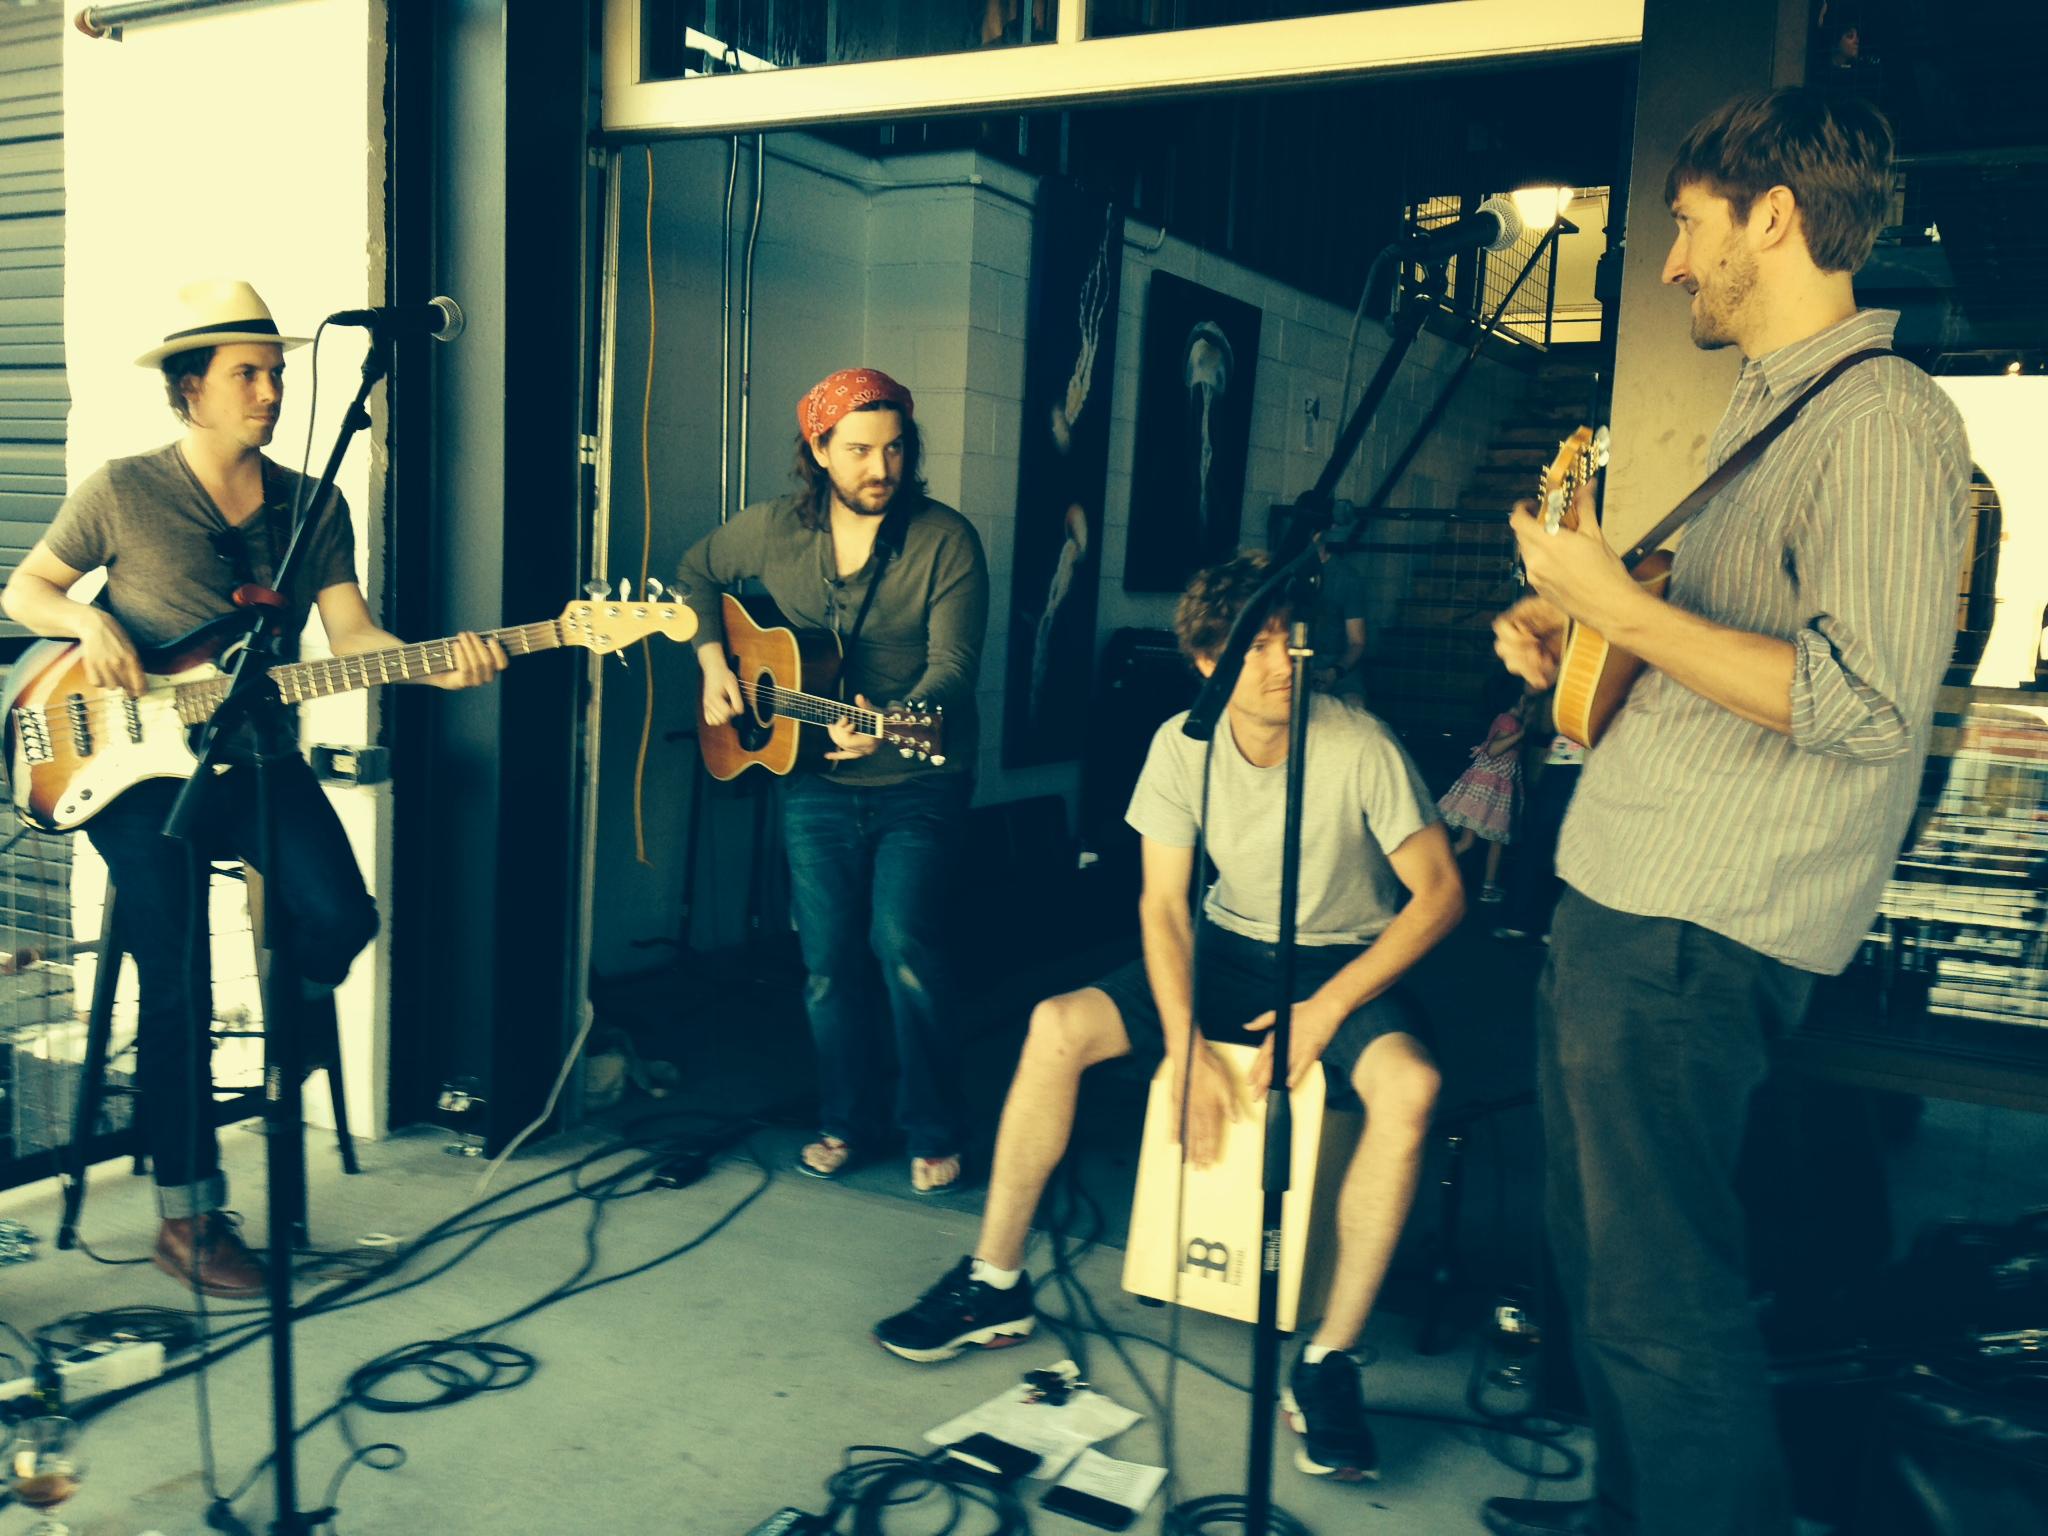 Steo Britton (Bass), Adam Dalton (Guitar), Brian Dowd (Cajon) & John Beck (Mandolin) at the Tennessee Brew Works on 4/19/14.